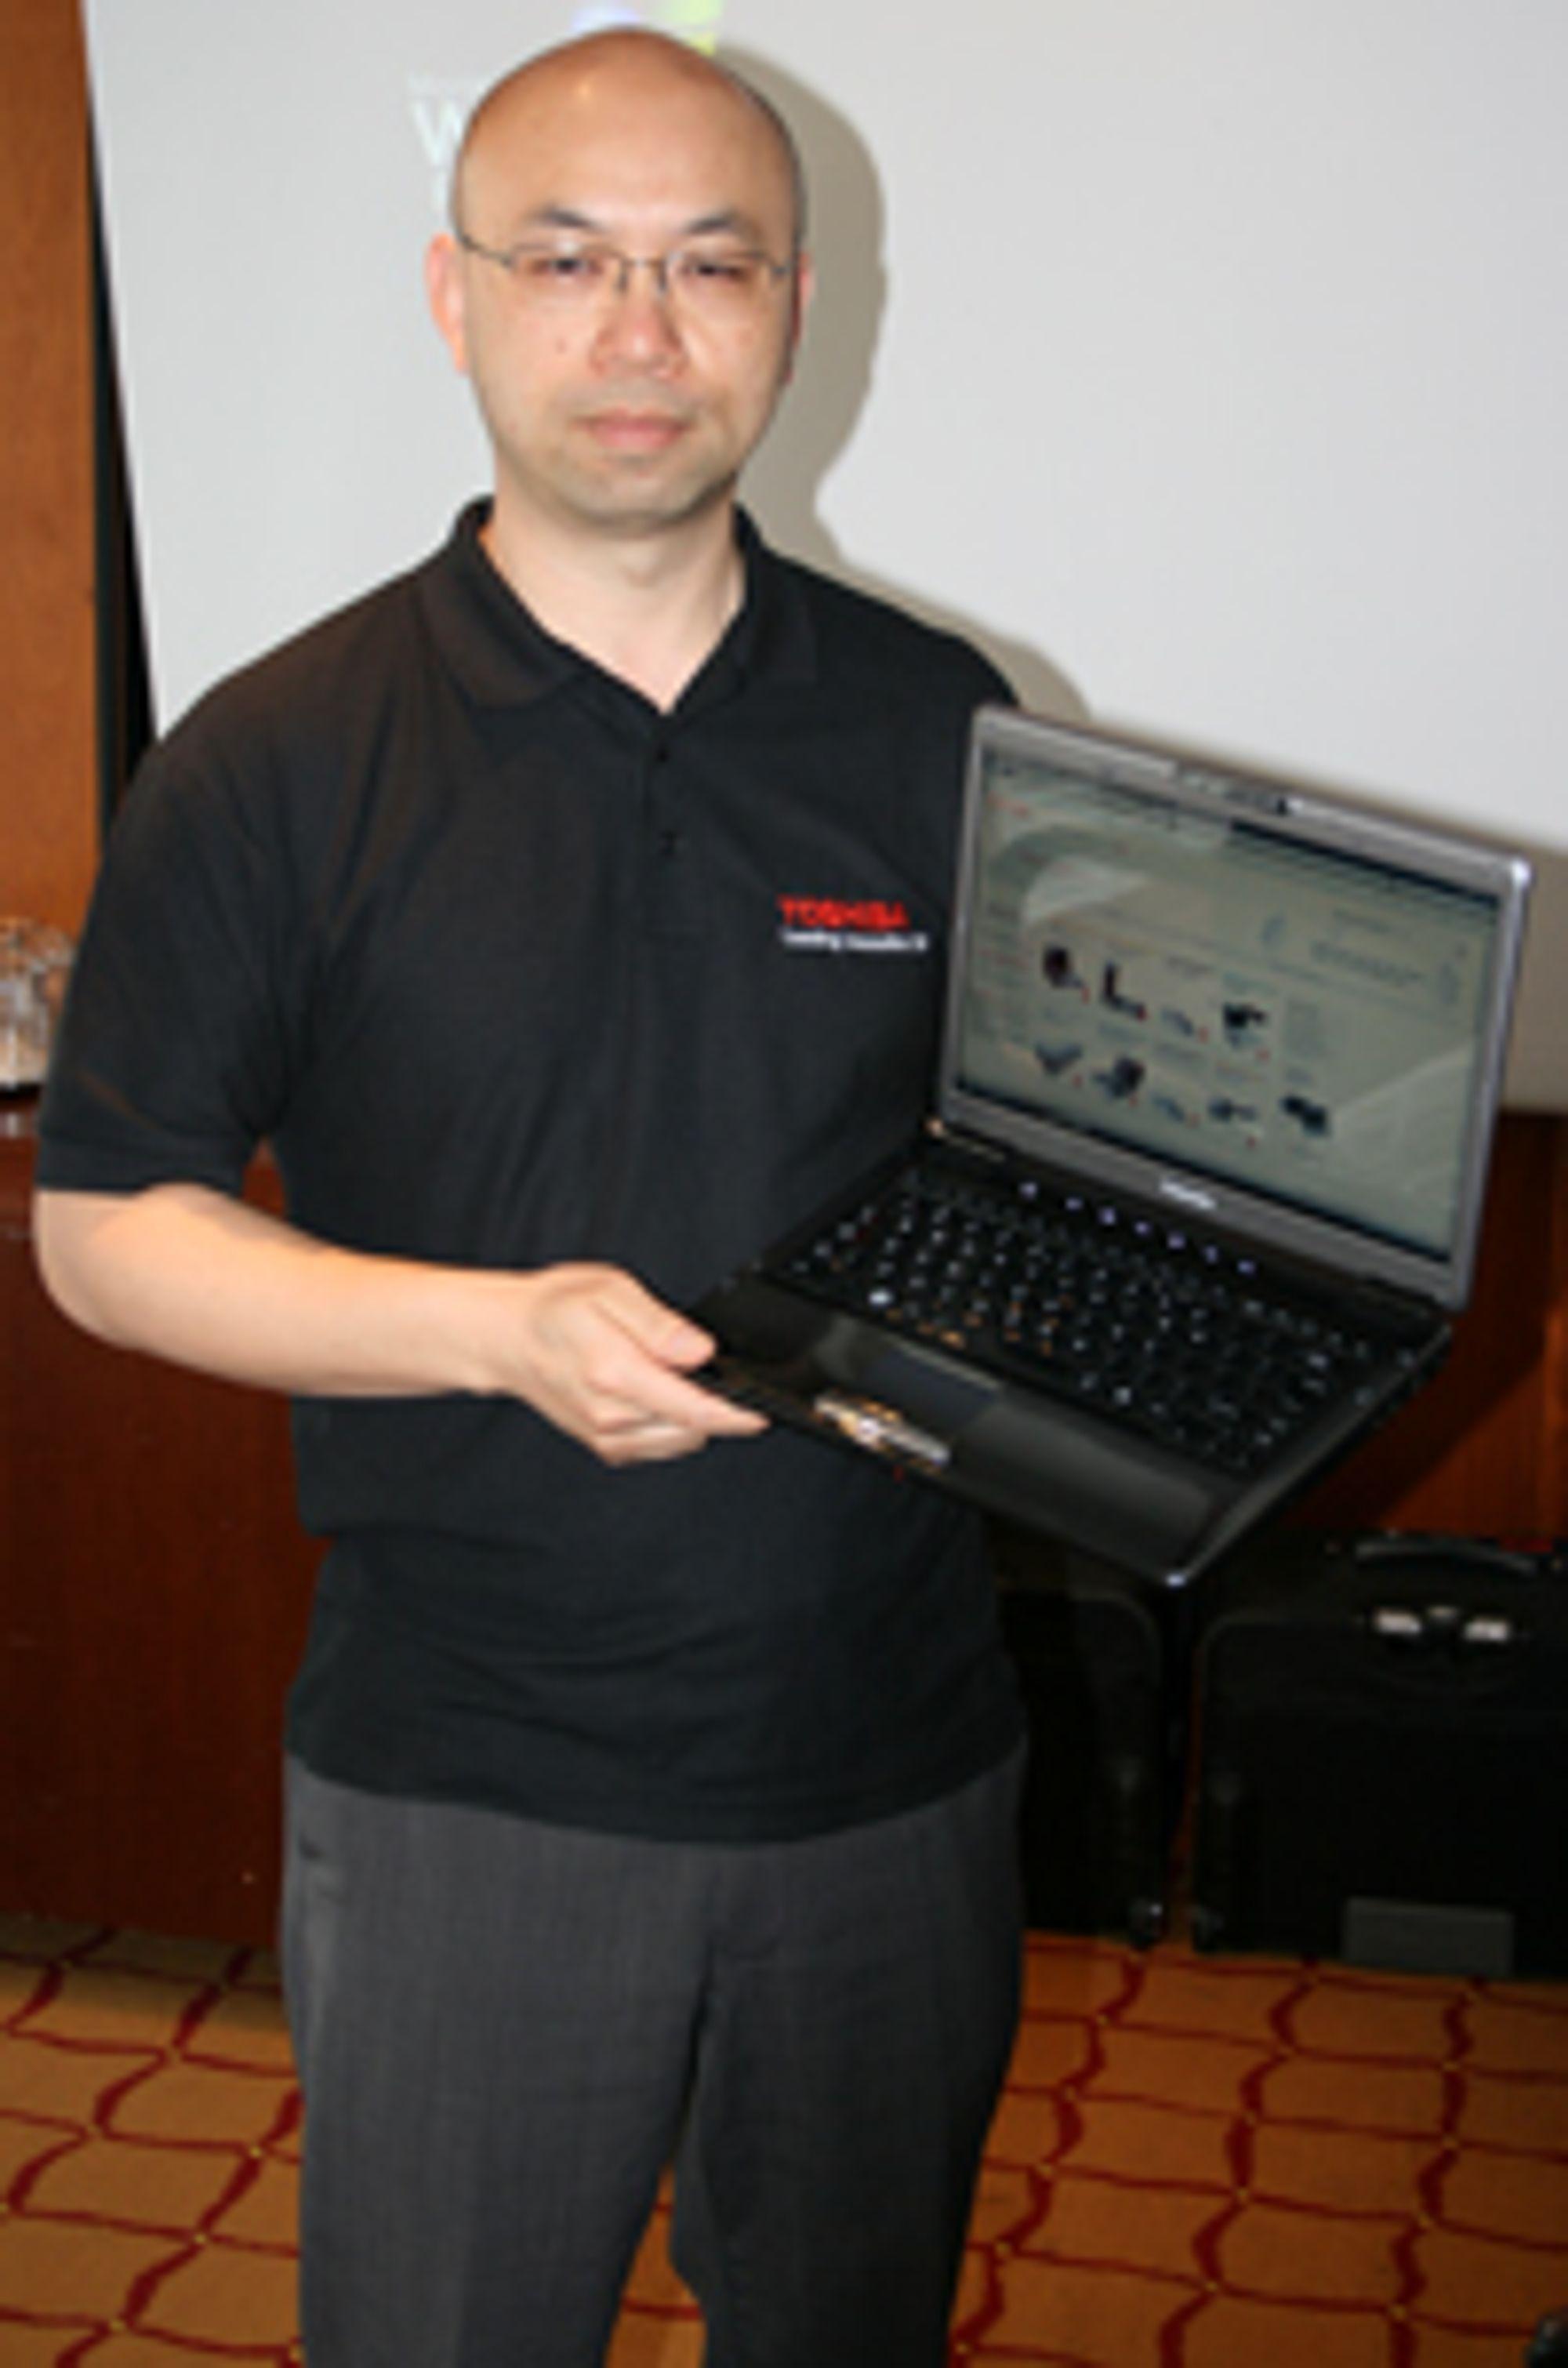 Ken Chan viser frem en Toshiba Satellite U400